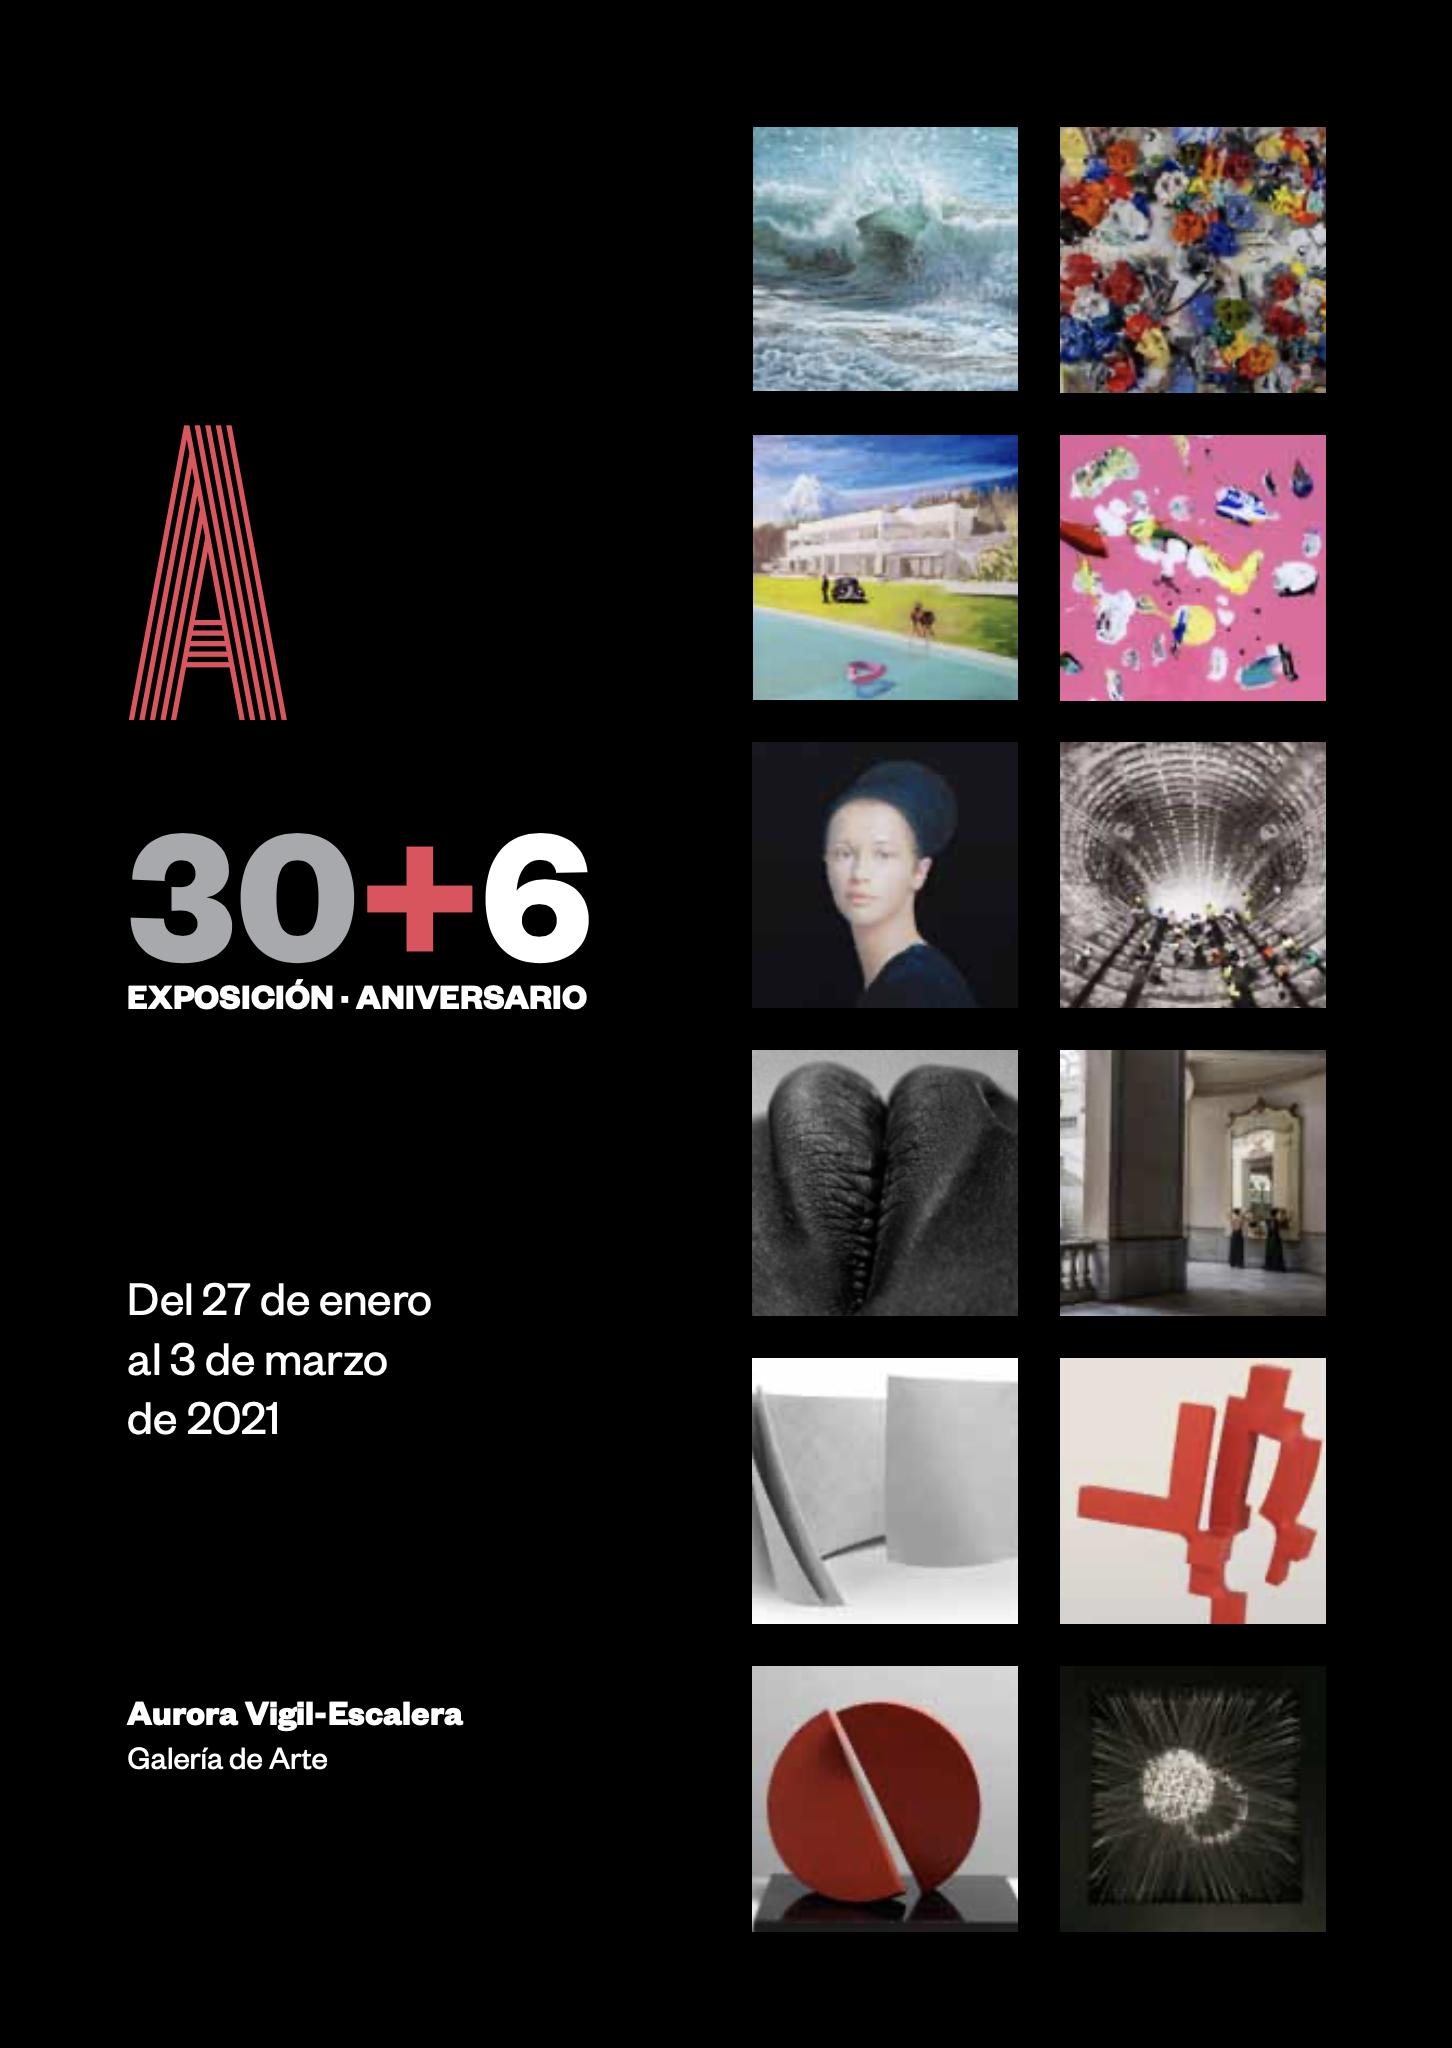 Exposici&oacuten Aniversario - 30+6